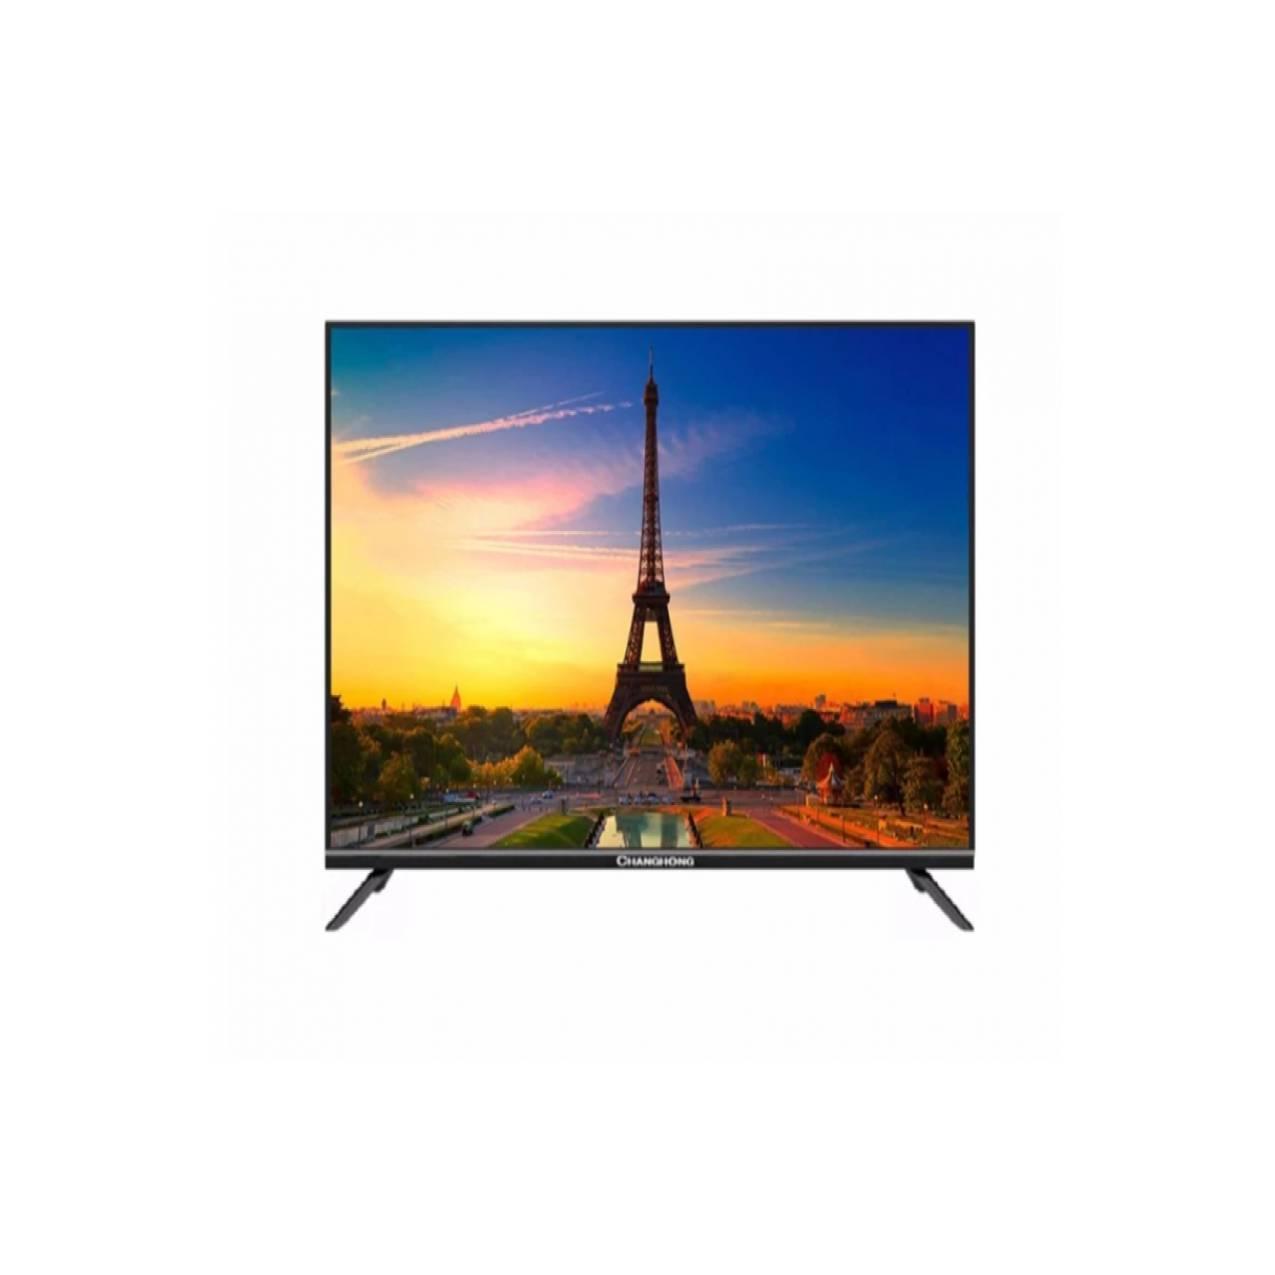 CHANGHONG LED TV 50 INCH - 50E2100